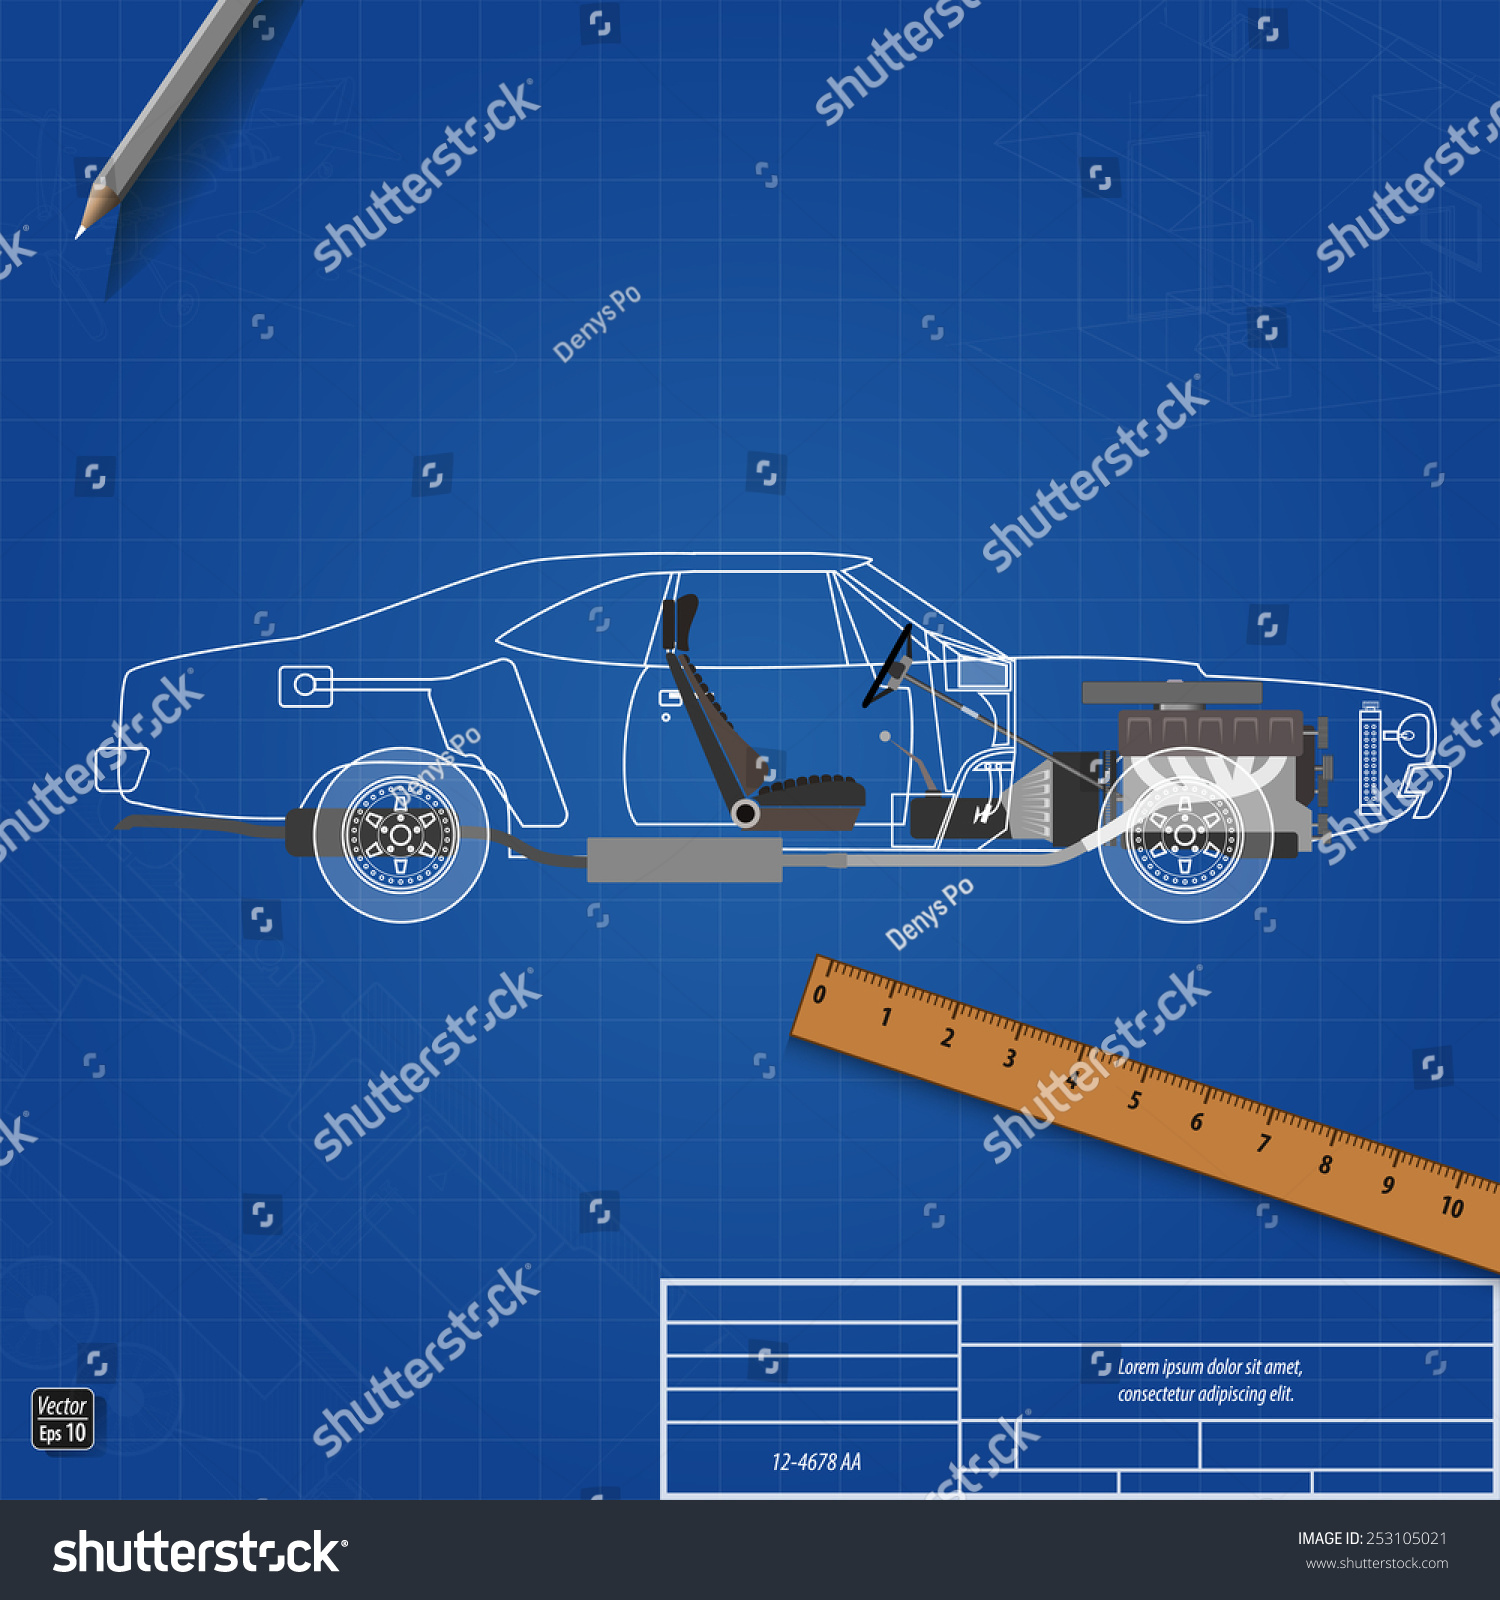 Blueprint car vector illustration eps 10 vectores en stock 253105021 blueprint car vector illustration eps 10 malvernweather Images